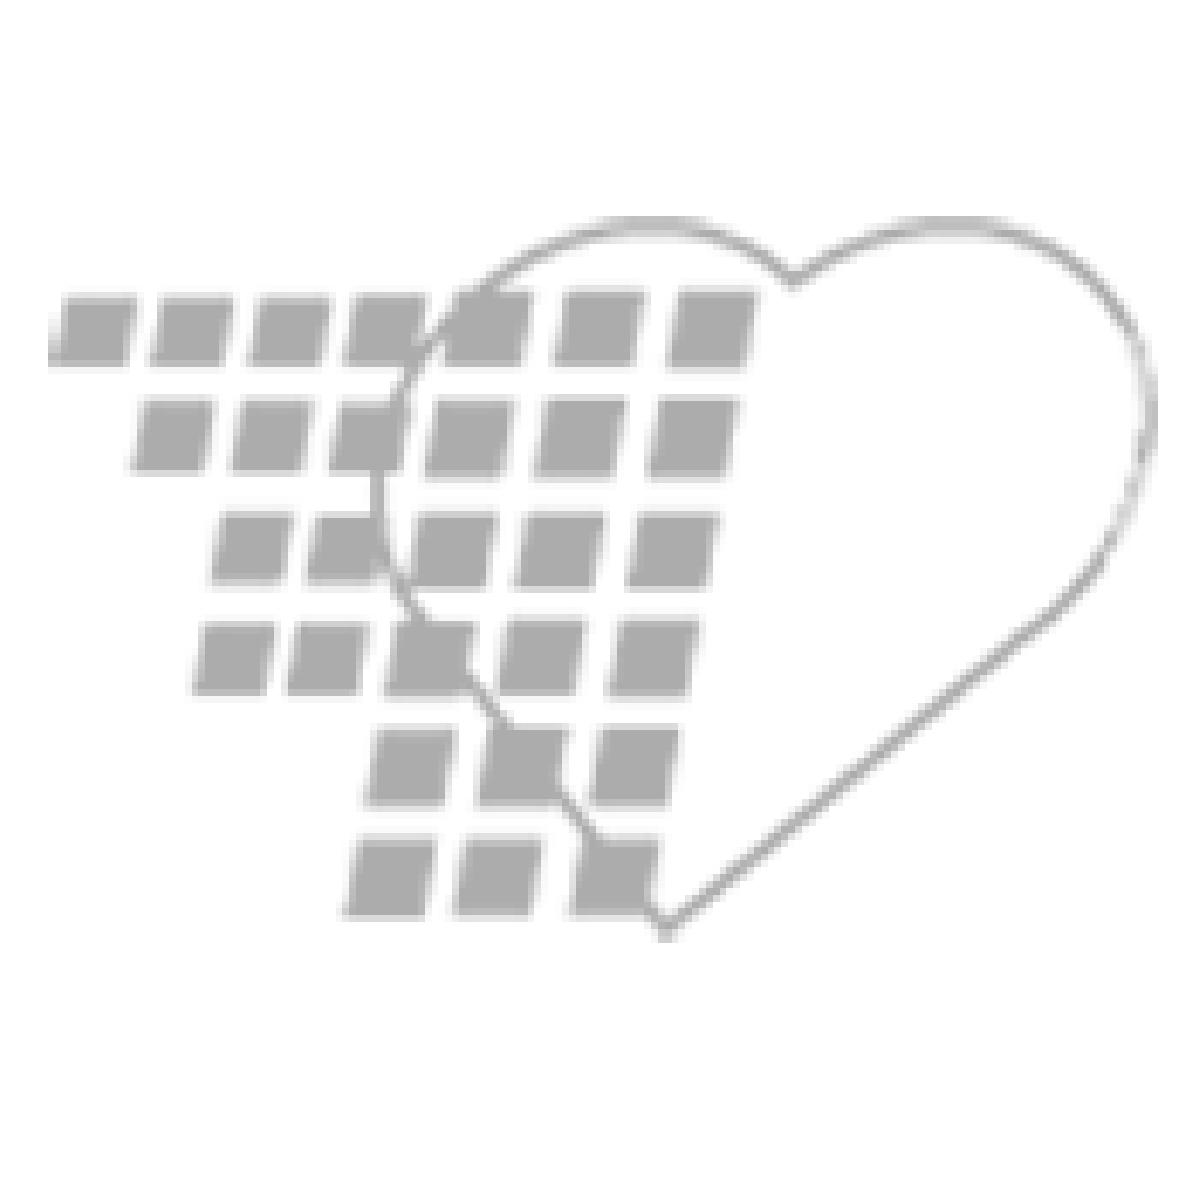 10-81-0120 - Human Pregnancy Pelvis Model